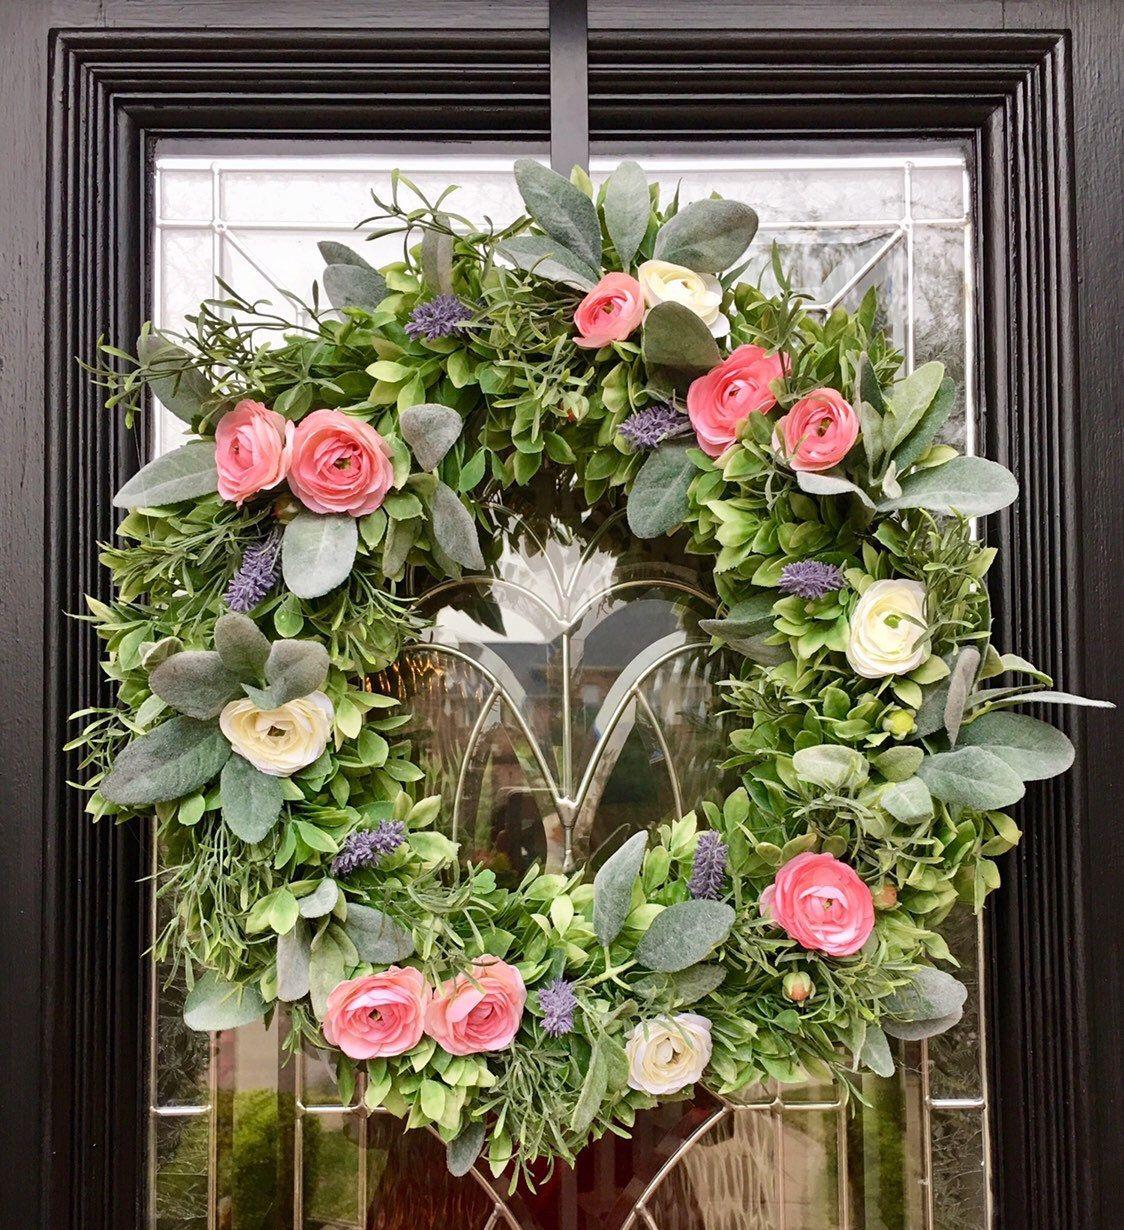 Photo of Farmhouse Wreath, Spring Wreath, Housewarming Gift, Wedding Gift, Lamb's Ear Wreath, floral wreath, year around wreath, modern farmhouse,